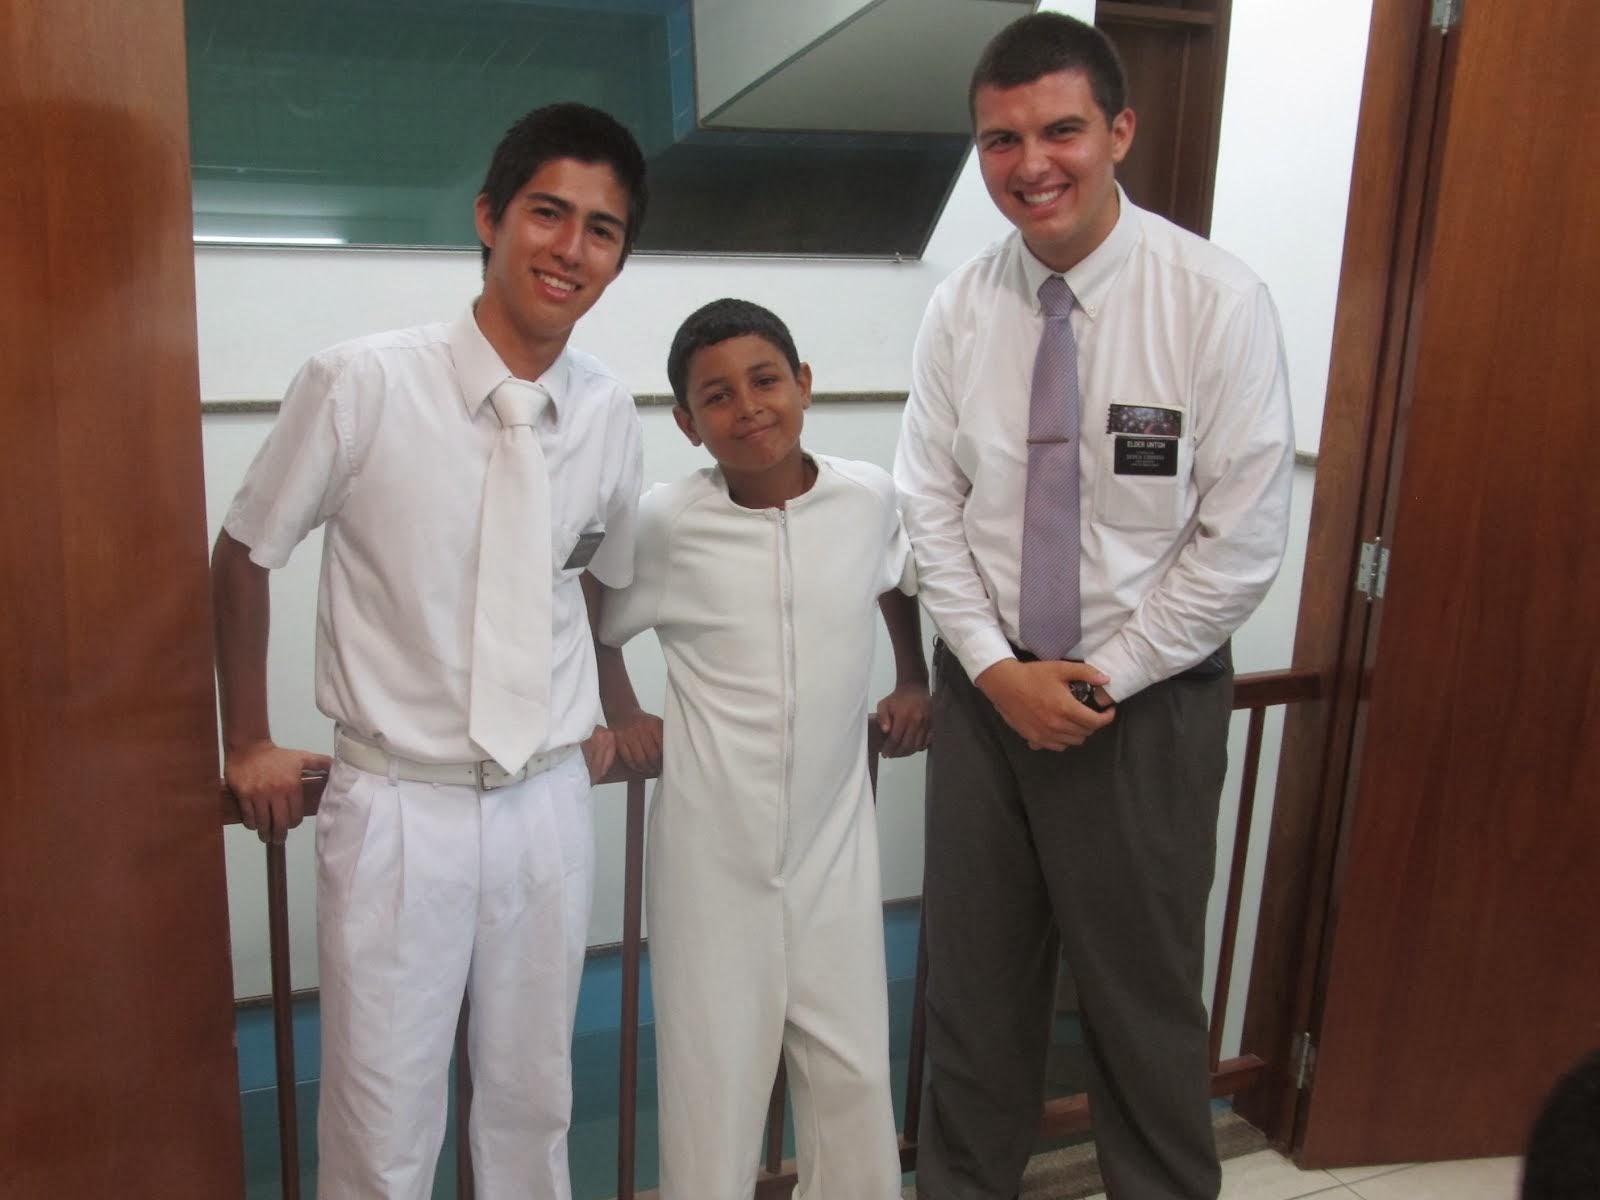 BAPTISM -- Oct. 16, 2013